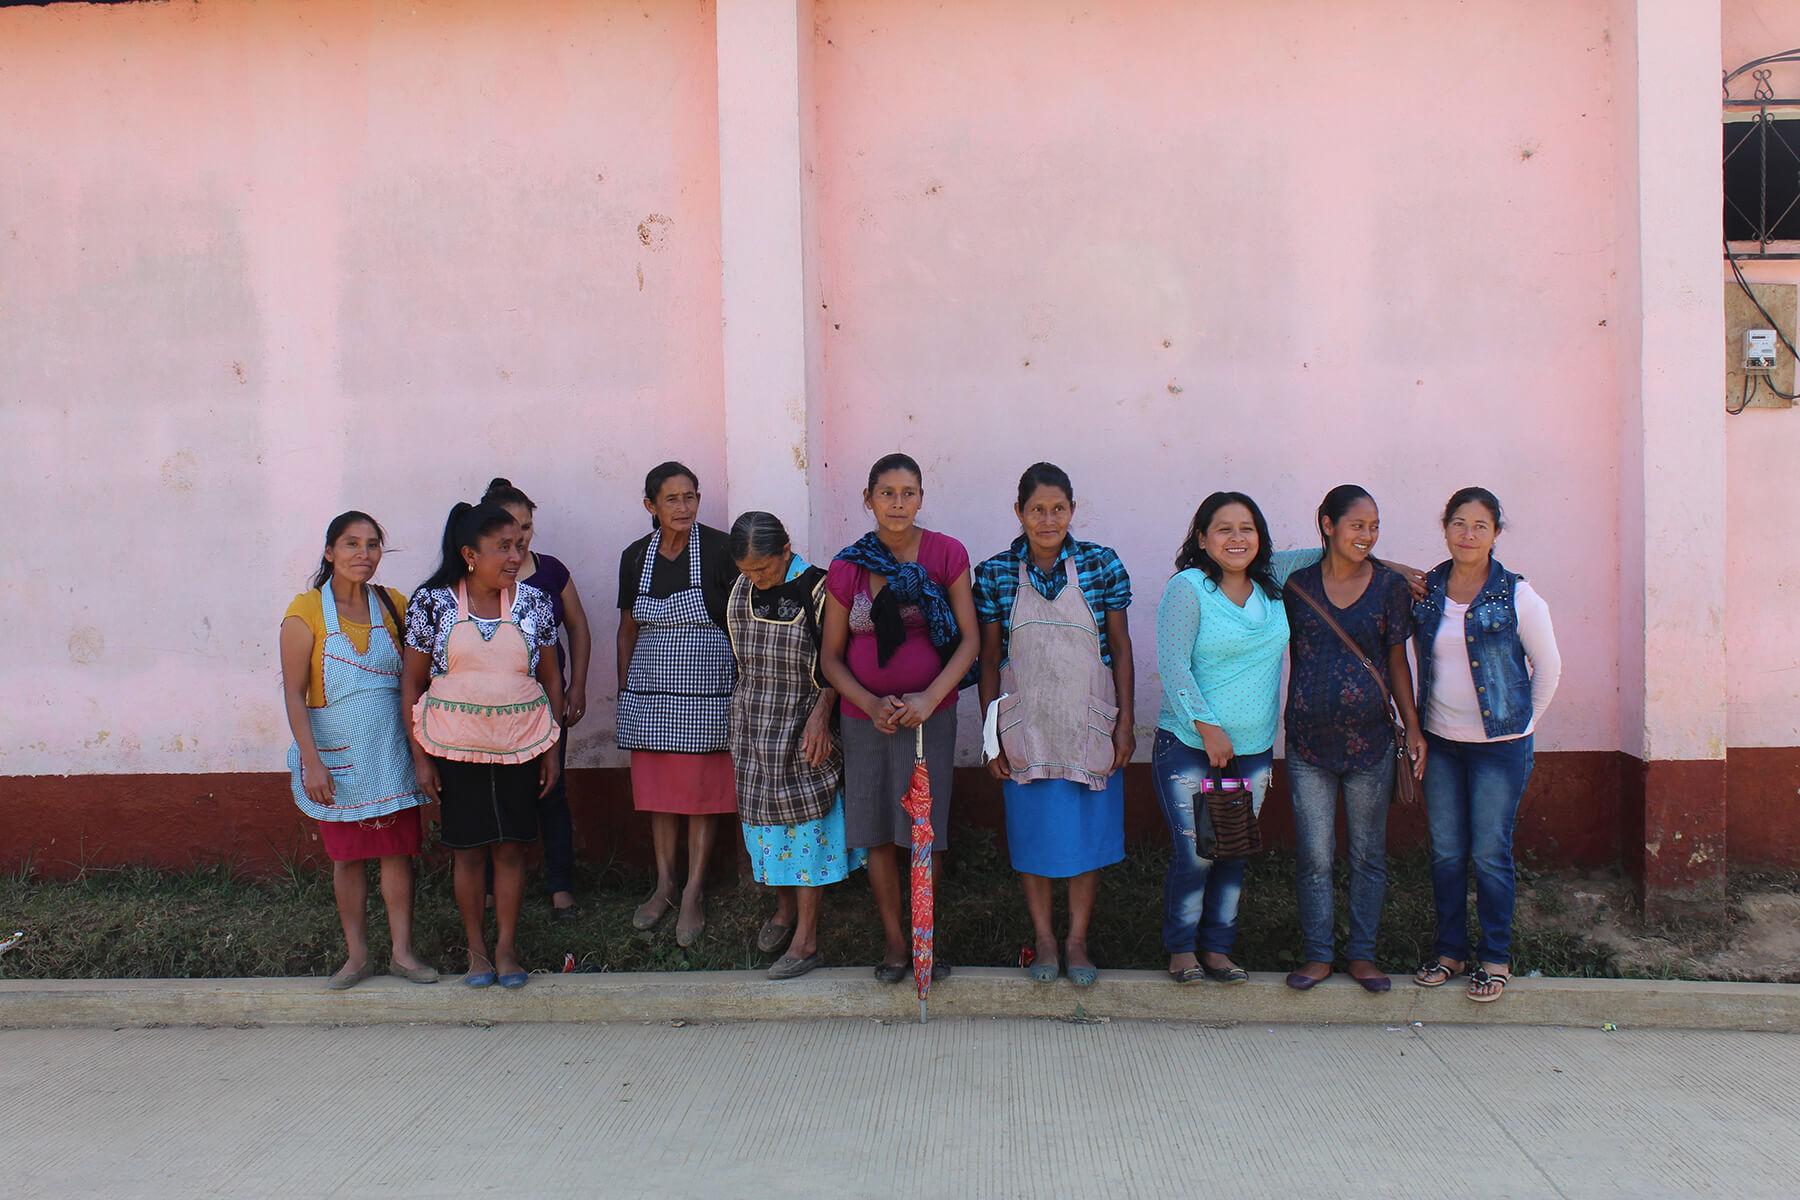 https://redstrandcoffee.com/wp-content/uploads/2019/04/Red-de-Mujeres.jpg